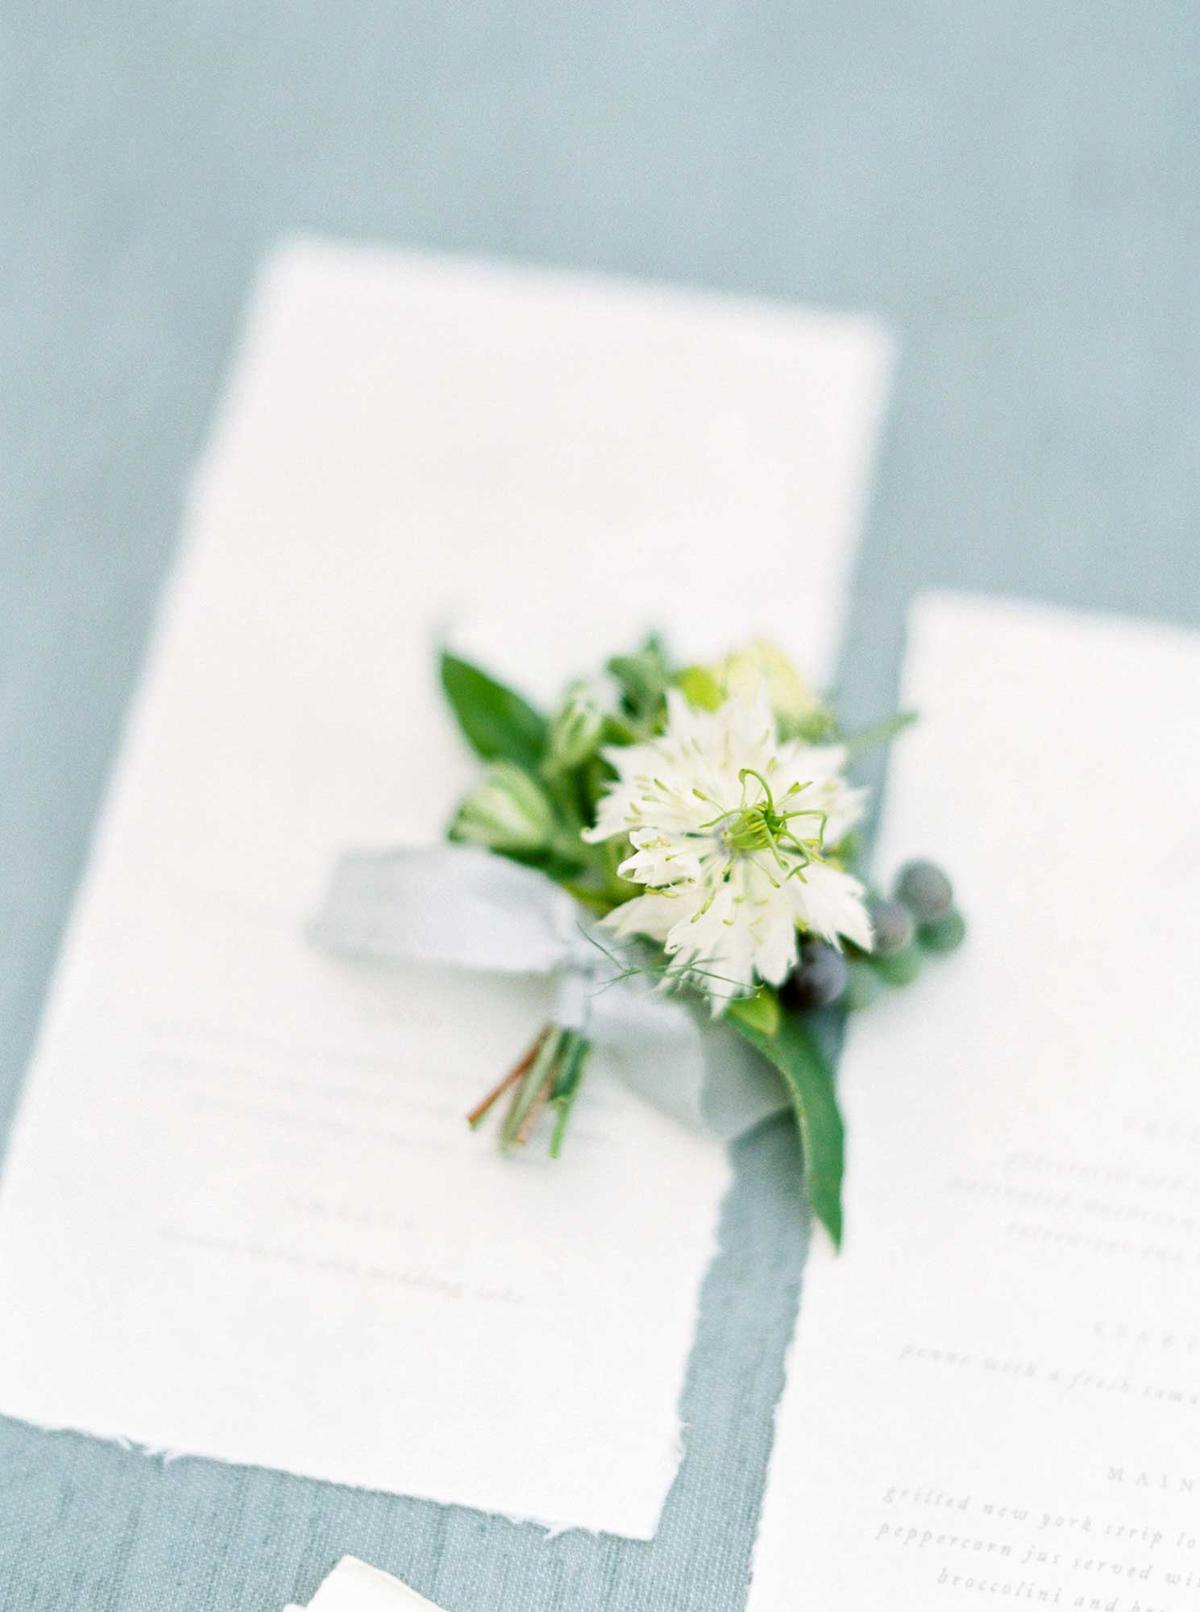 kayla-yestal-vineyard-bride-swish-list-woodland-weddings-niagara-wedding-editorial-17.jpg